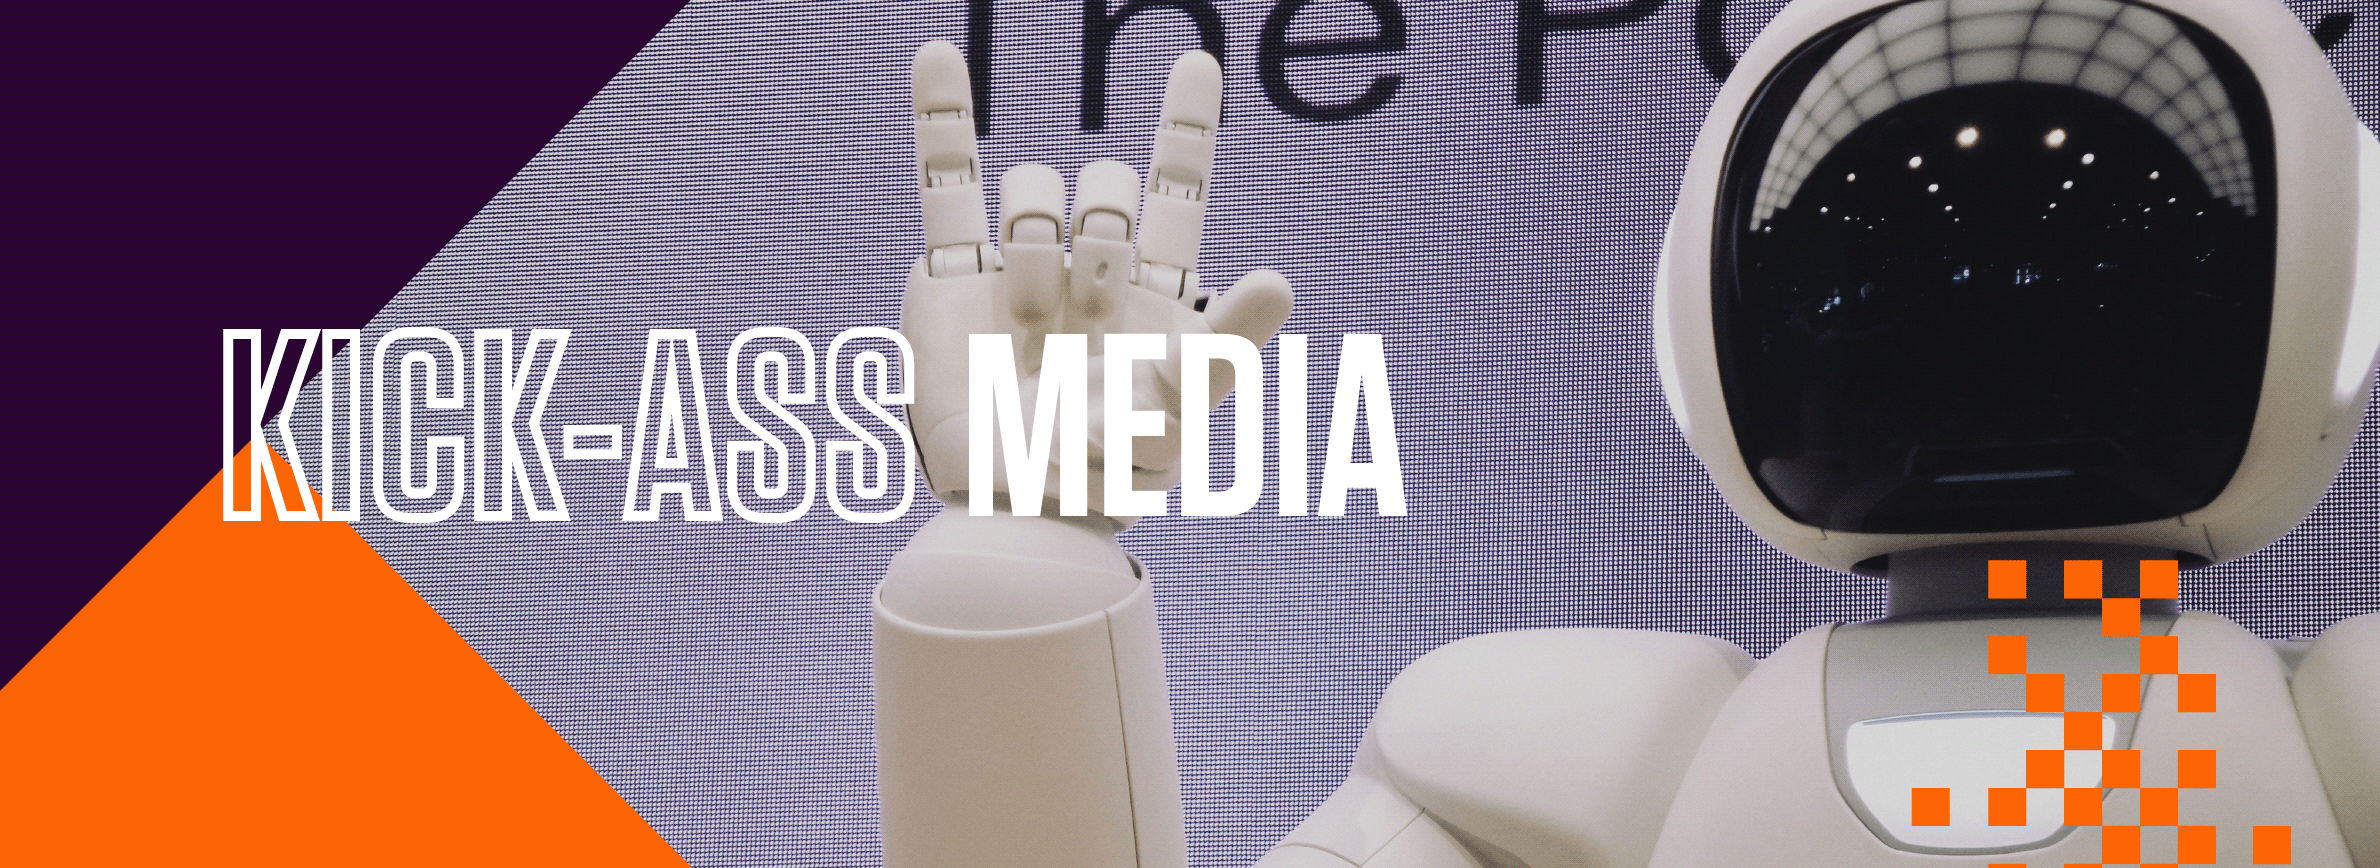 banner_kick-as_media@2x-8.png